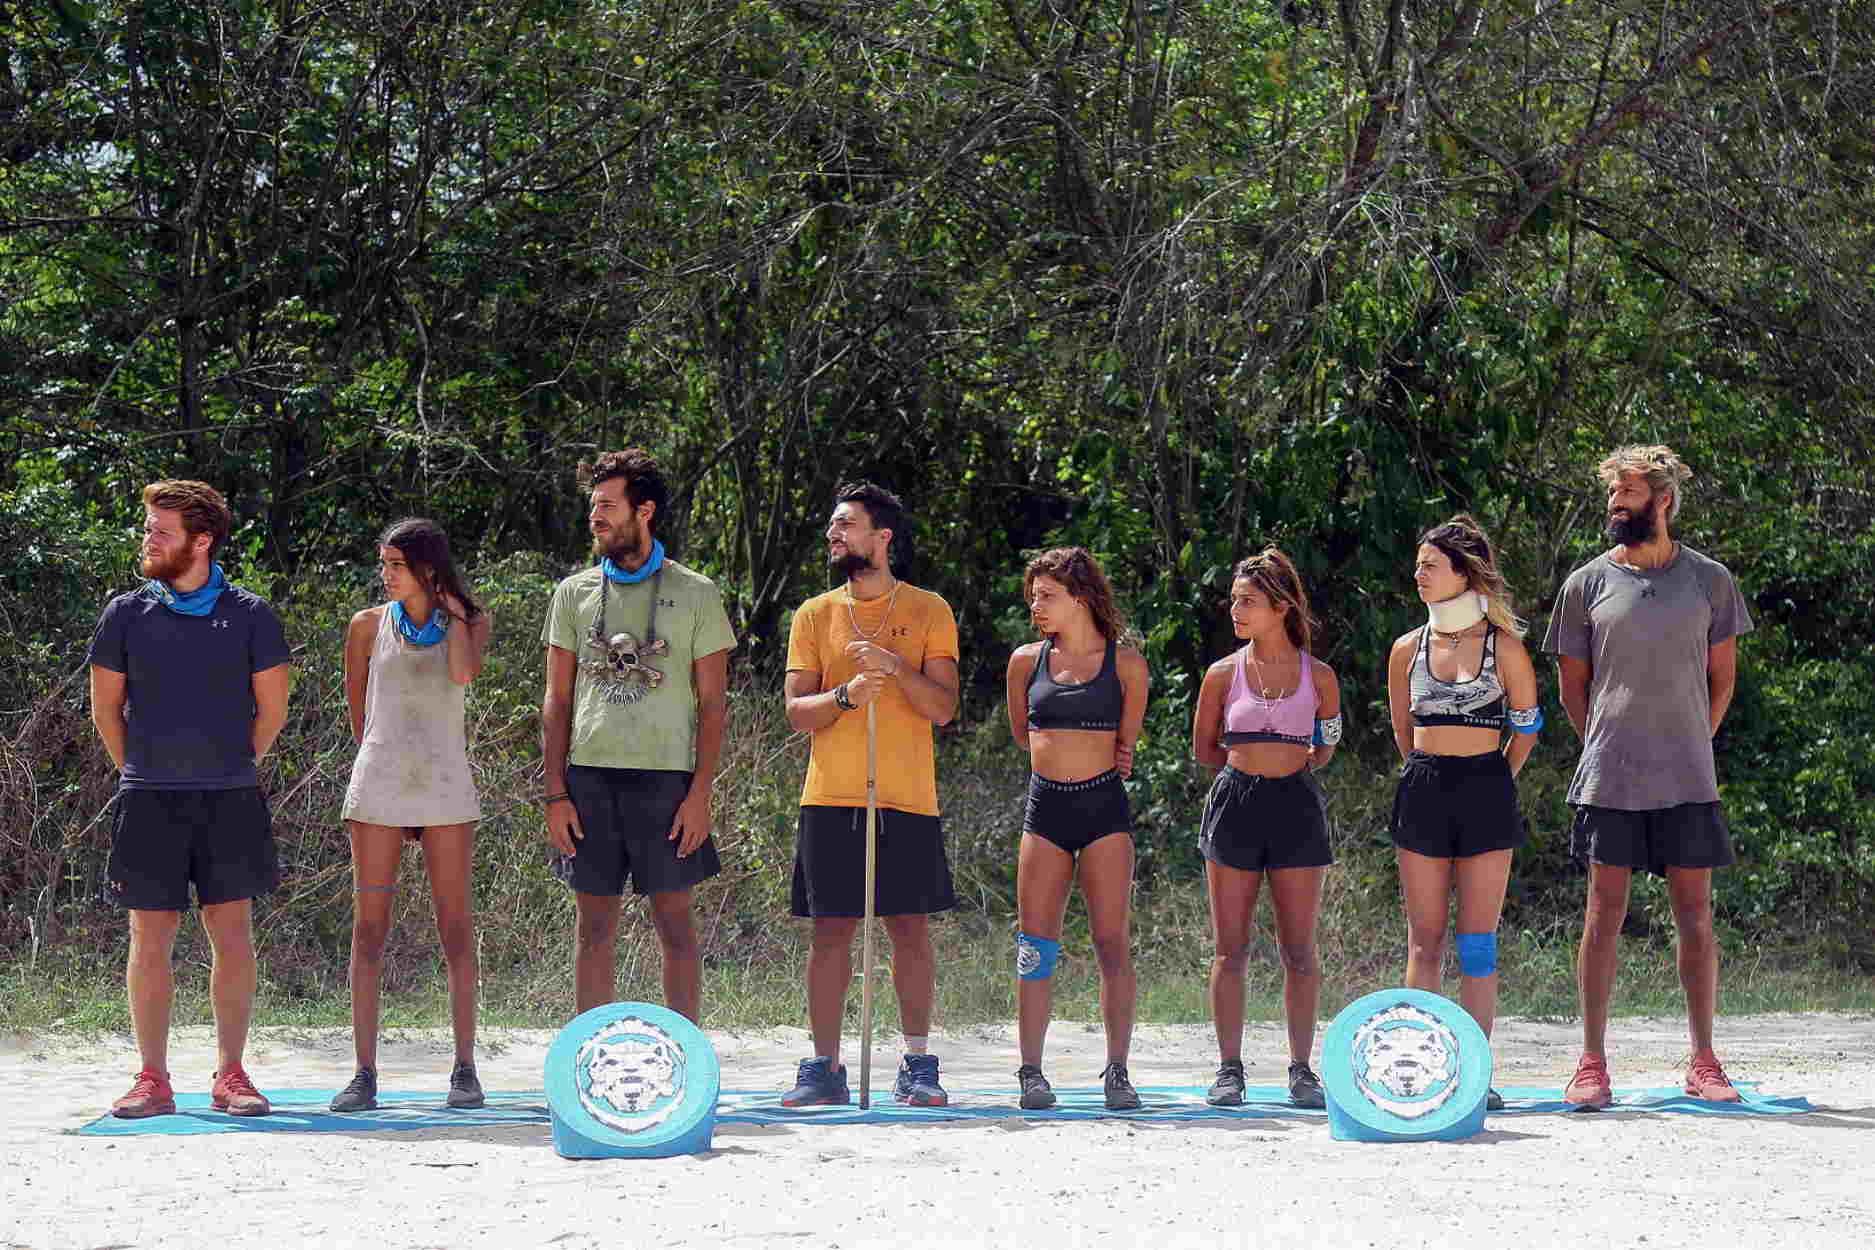 Survivor: Διχασμένη η μπλε ομάδα – Ποιοι δεν θέλουν να αγωνιστούν;